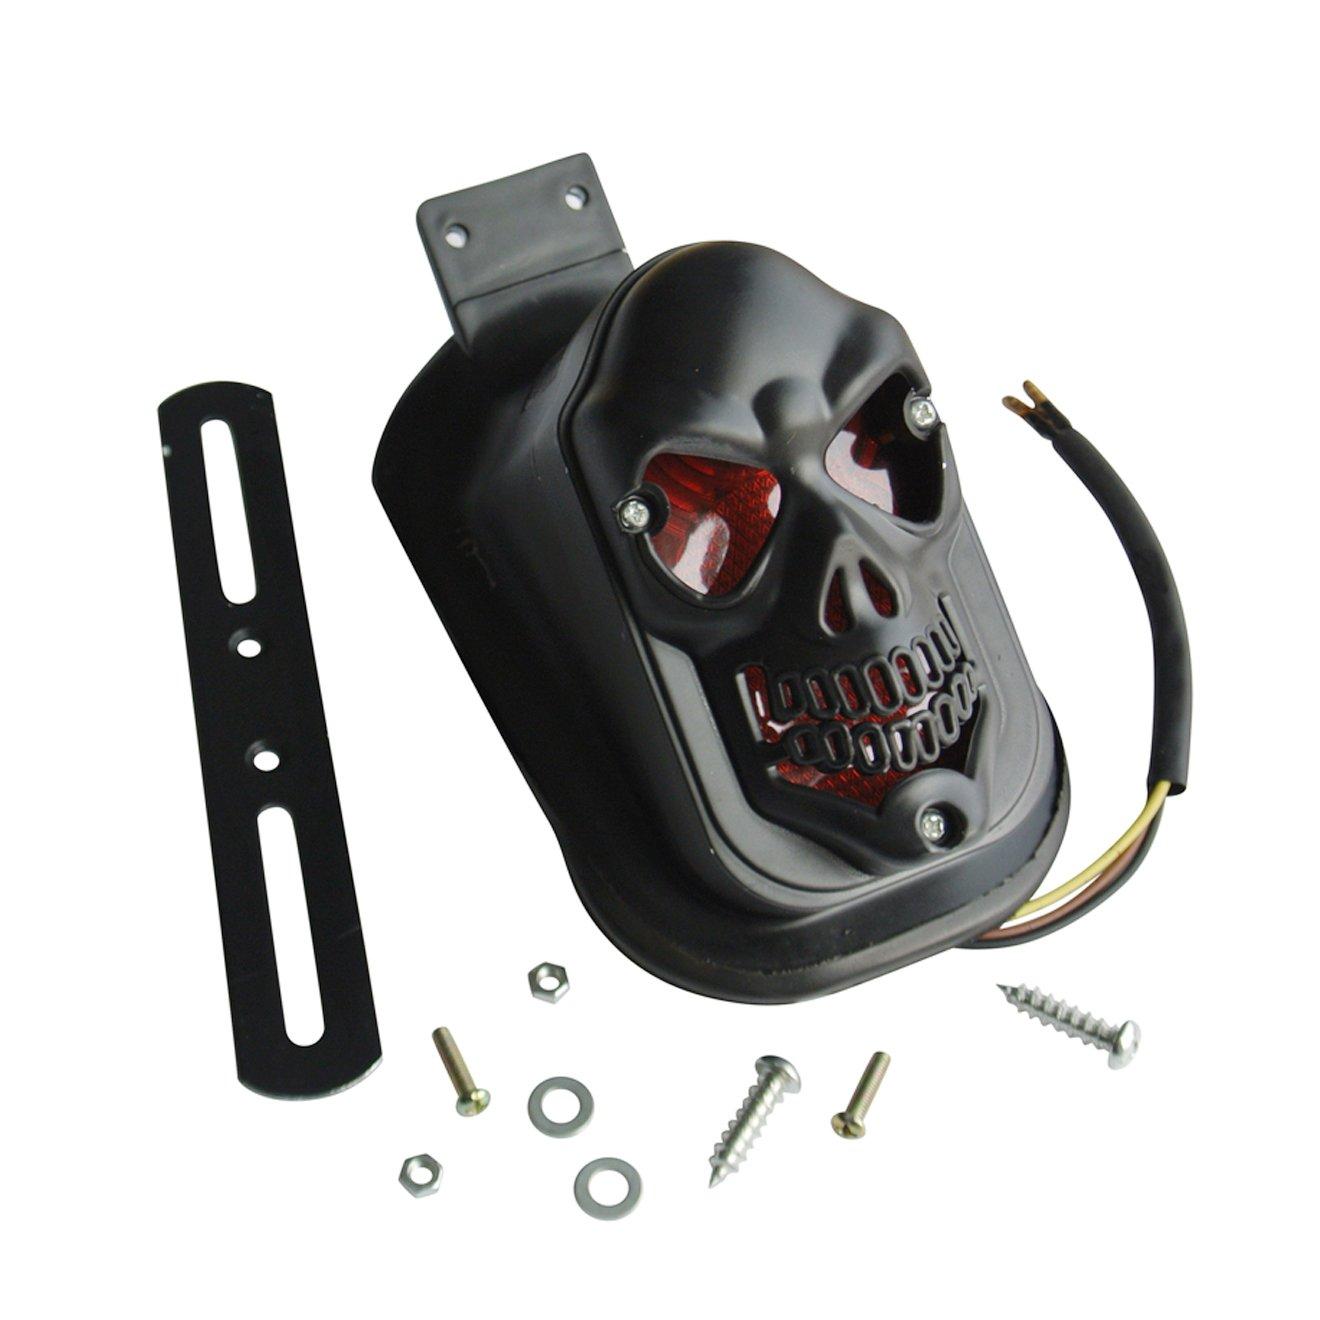 New Black Skull Rear Brake Tail Light For Harley Motorcycle Parts